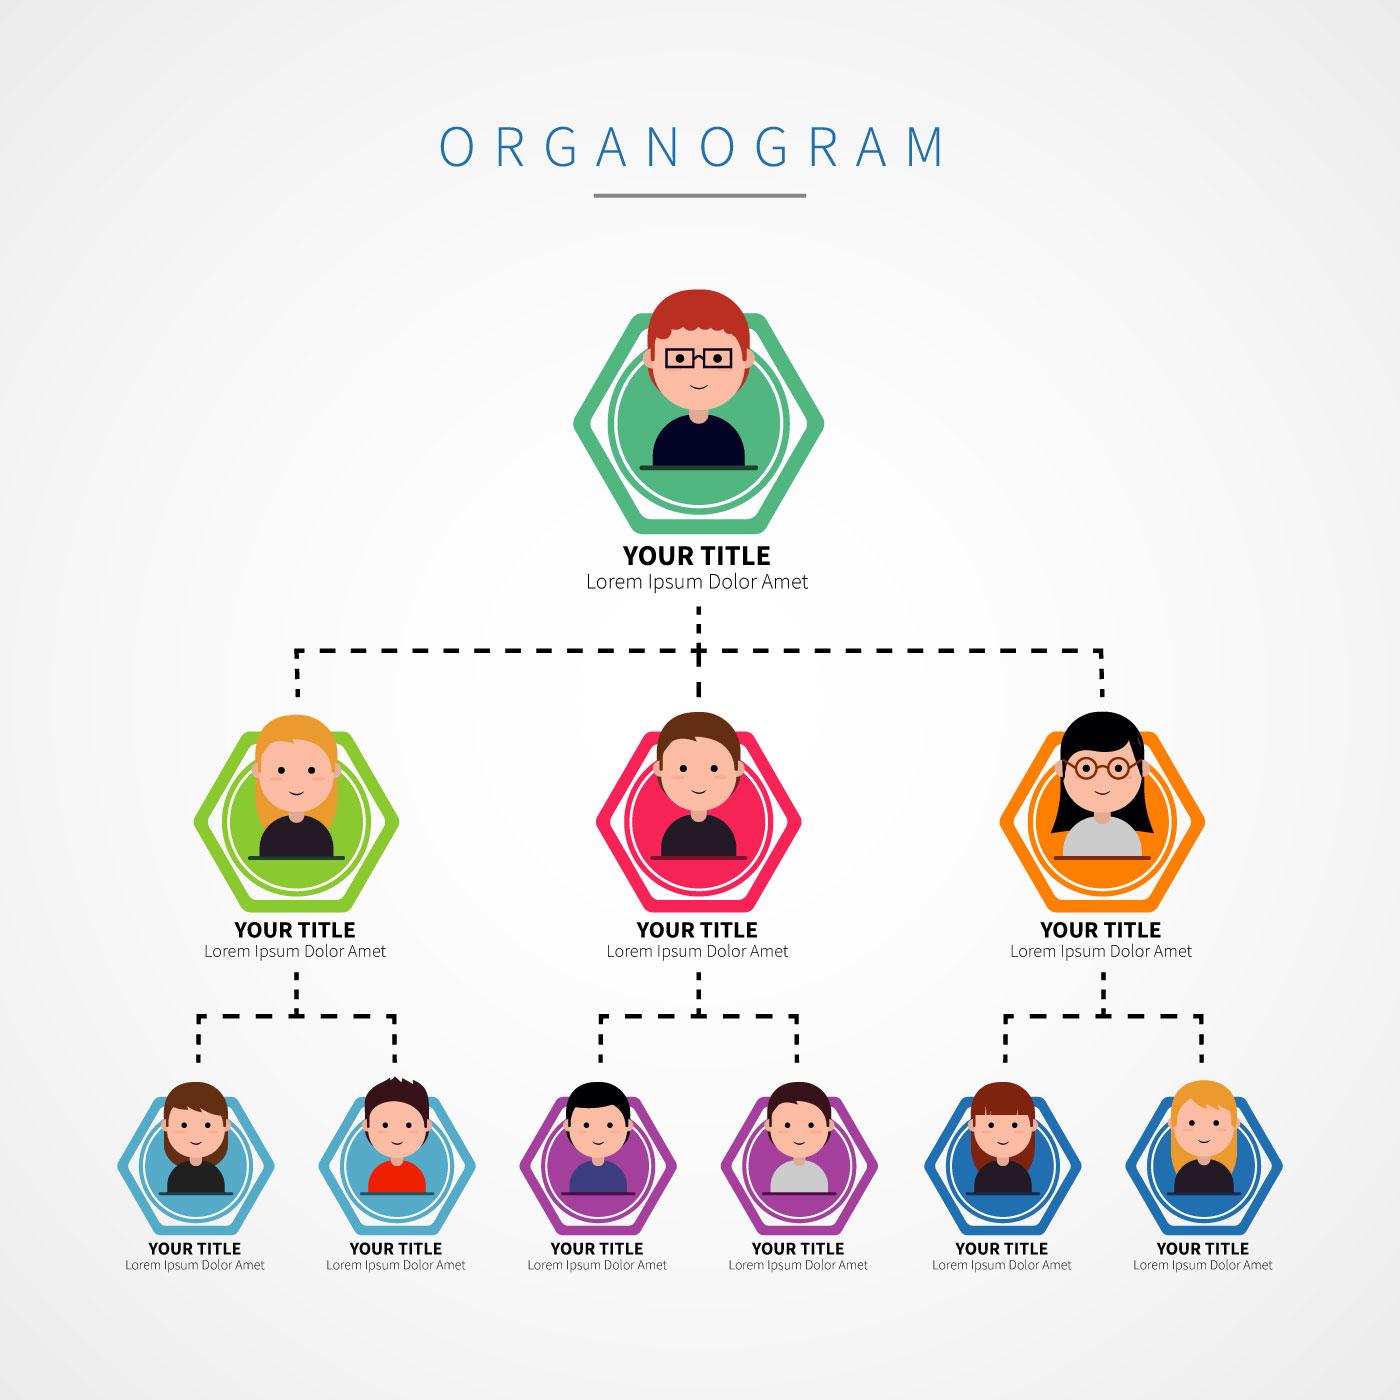 flat organogram illustration